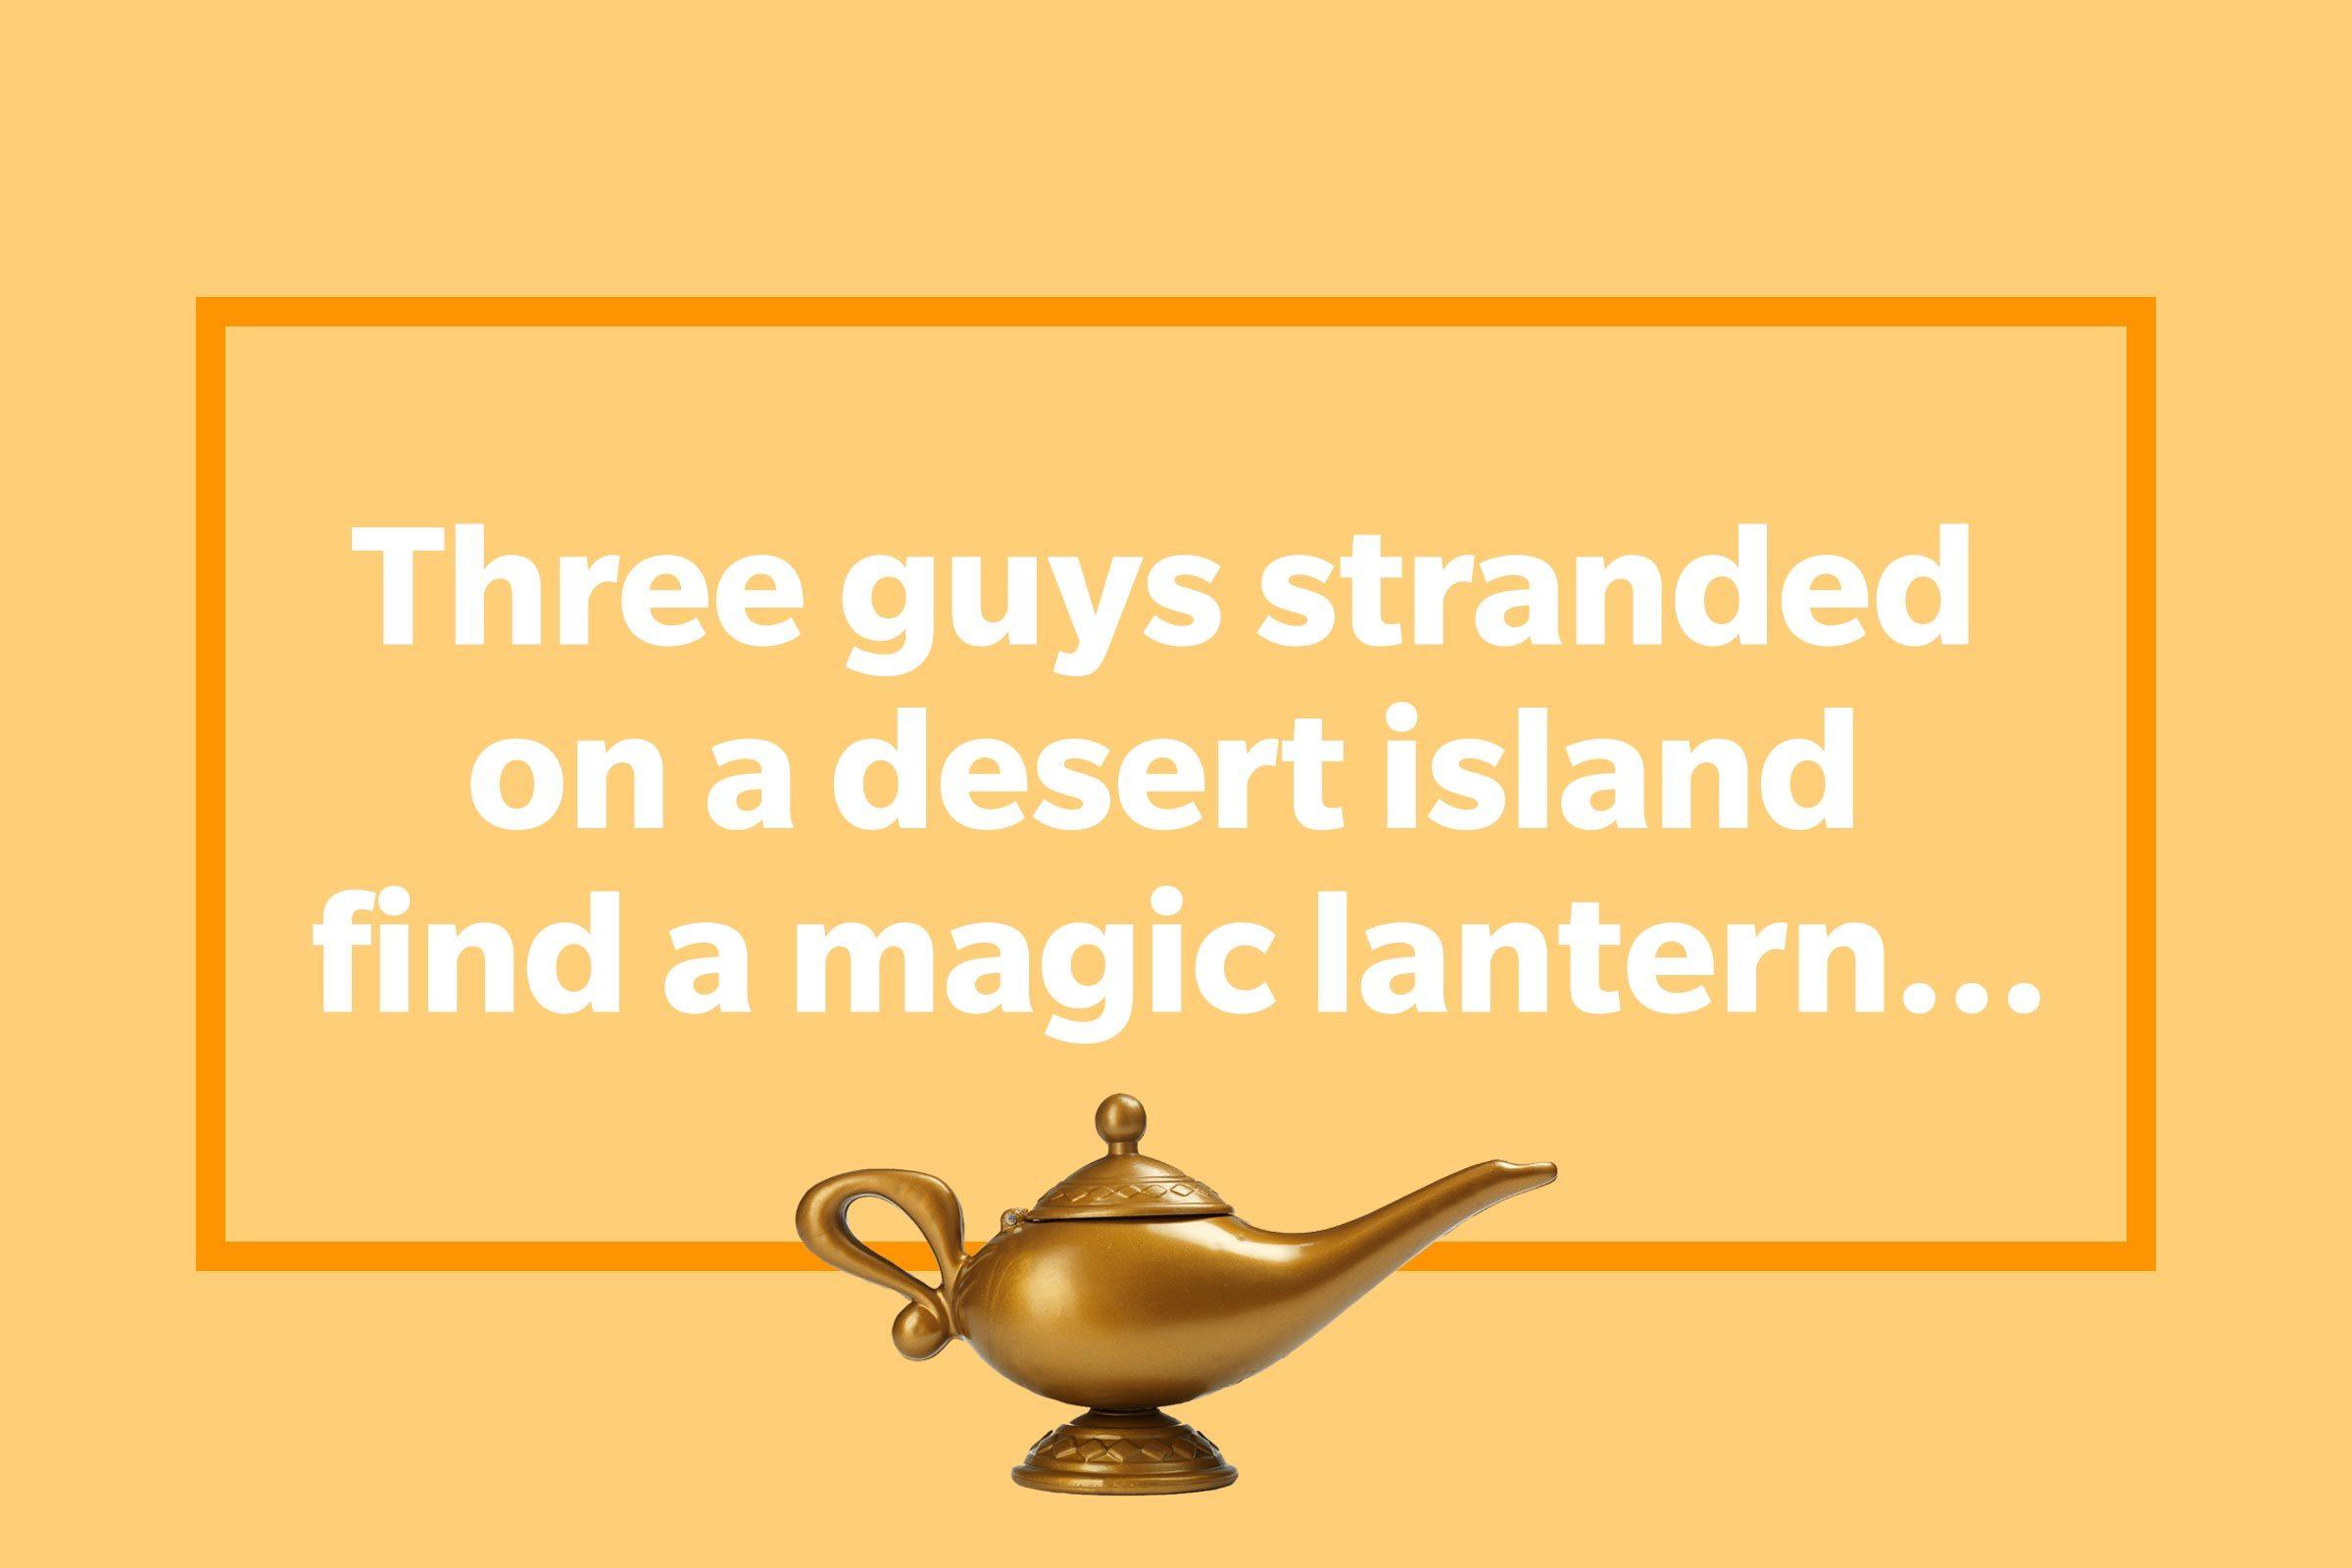 Three guys stranded on a desert island find a magic lantern